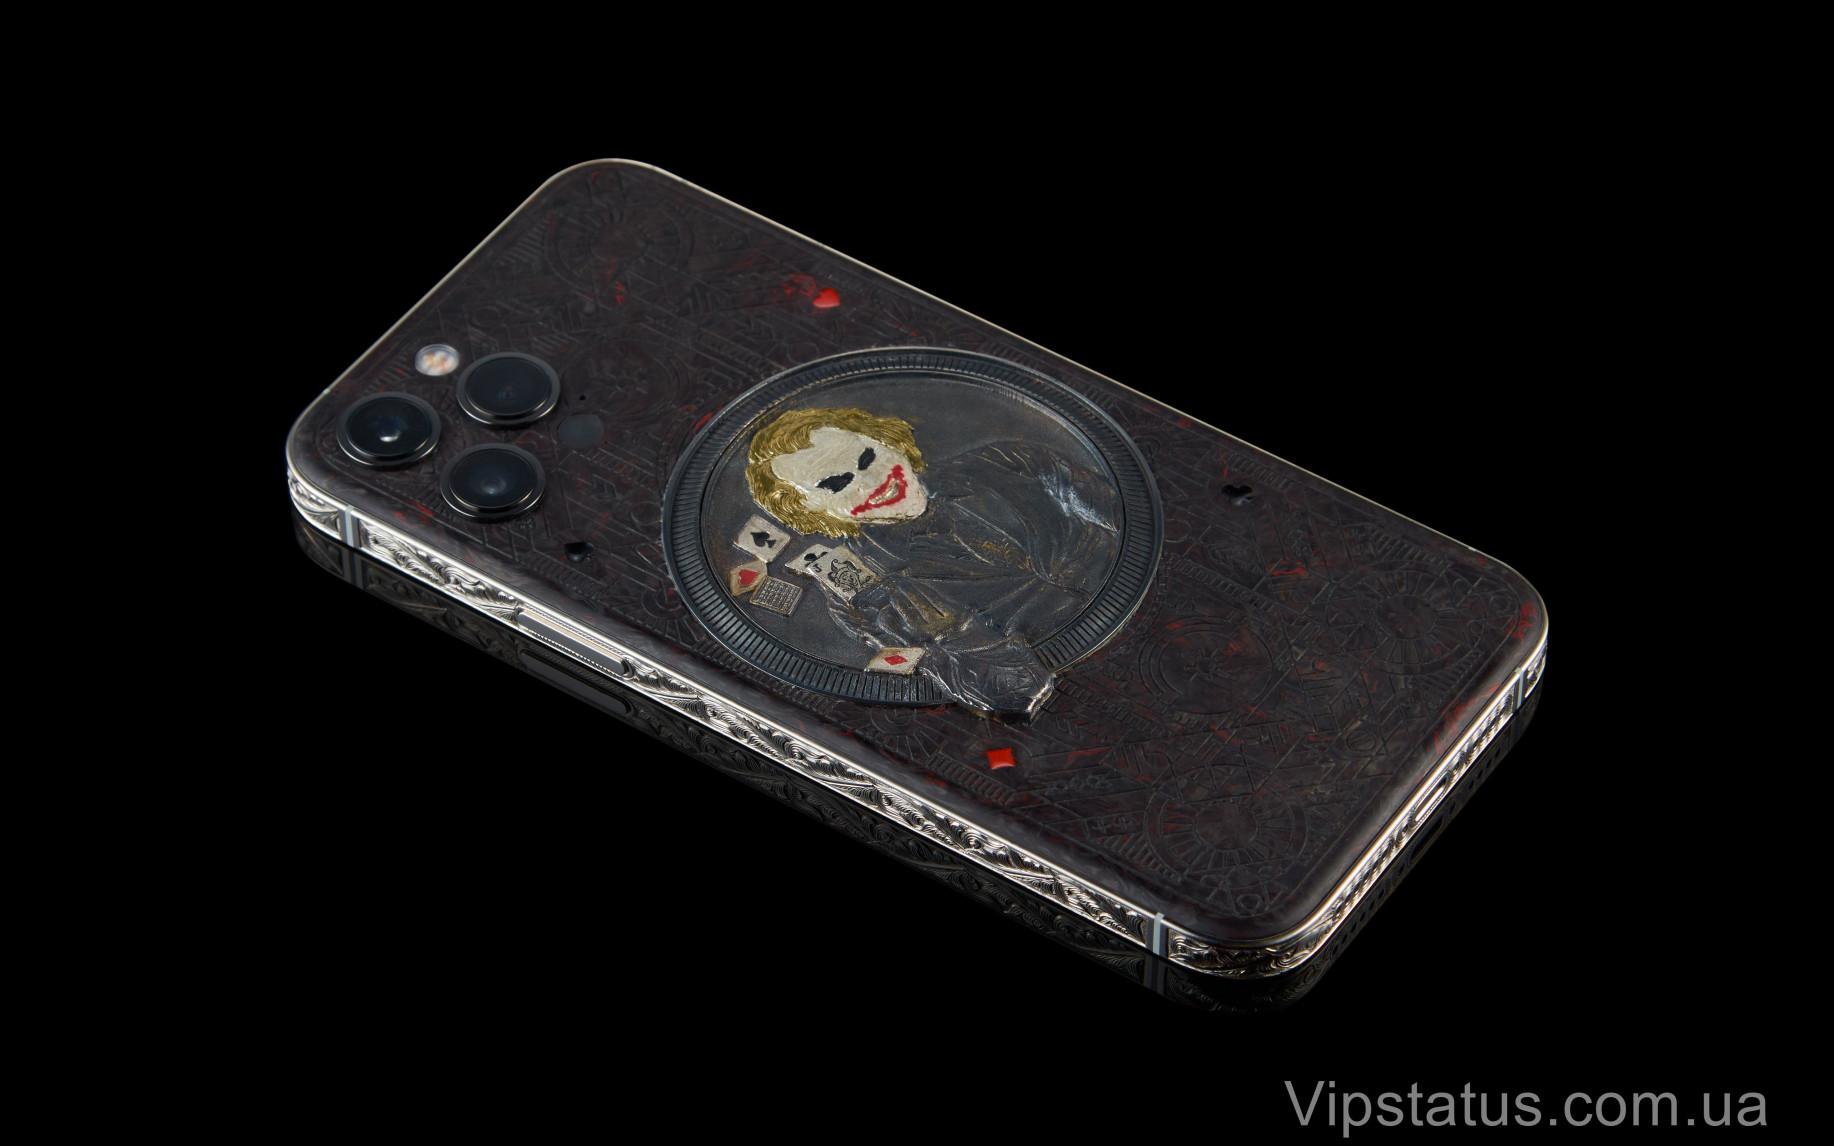 Elite Dark Joker IPHONE 13 PRO MAX 512 GB Dark Joker IPHONE 13 PRO MAX 512 GB image 3